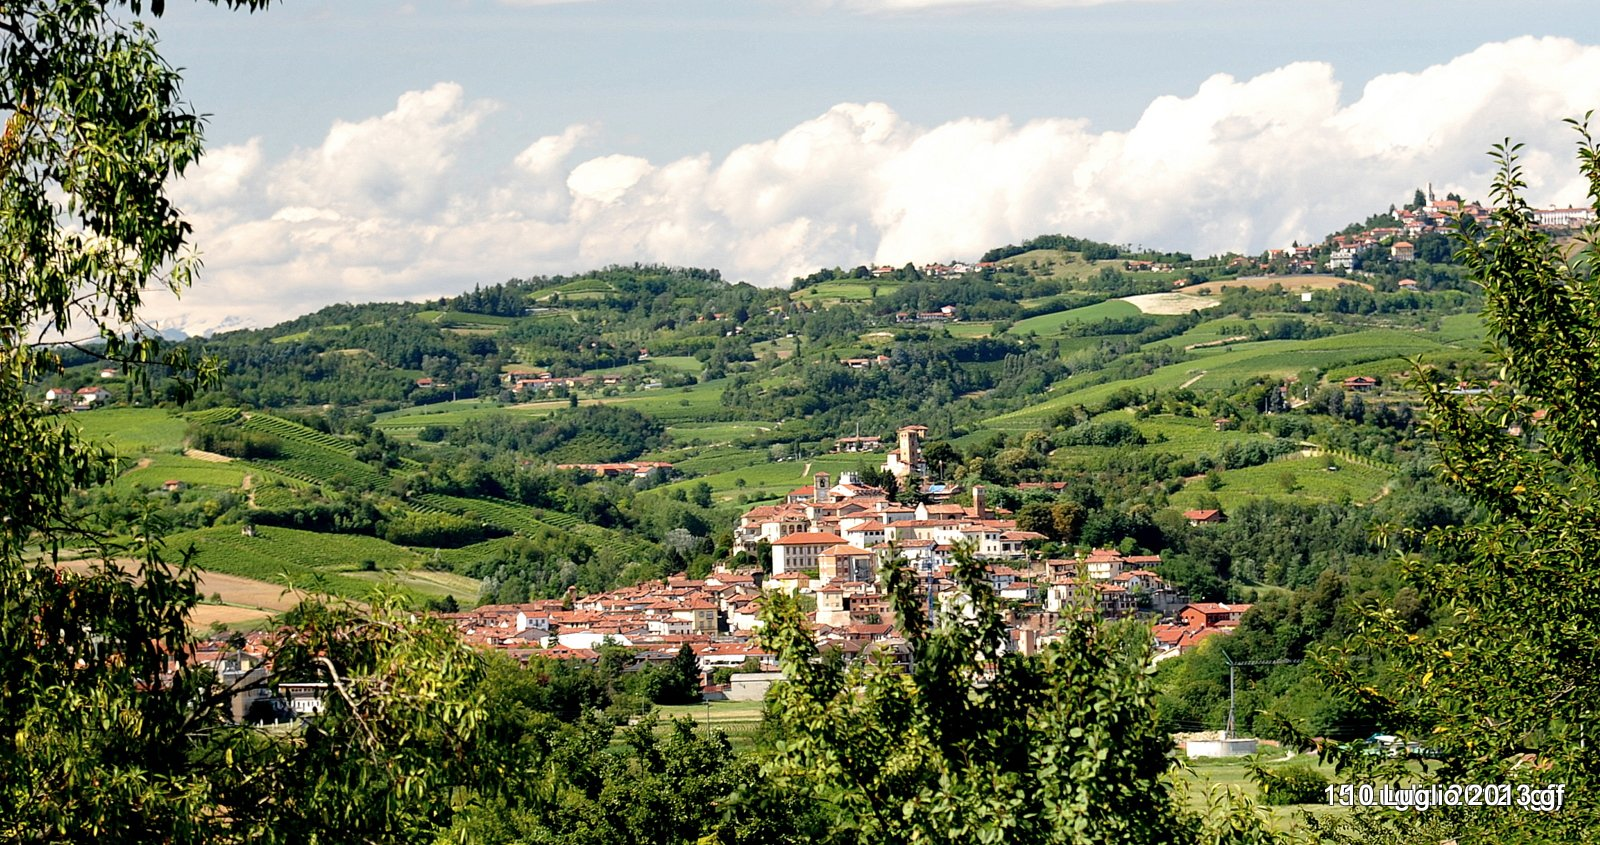 Piedmont - Malvasia di Castelnuovo Don Bosco